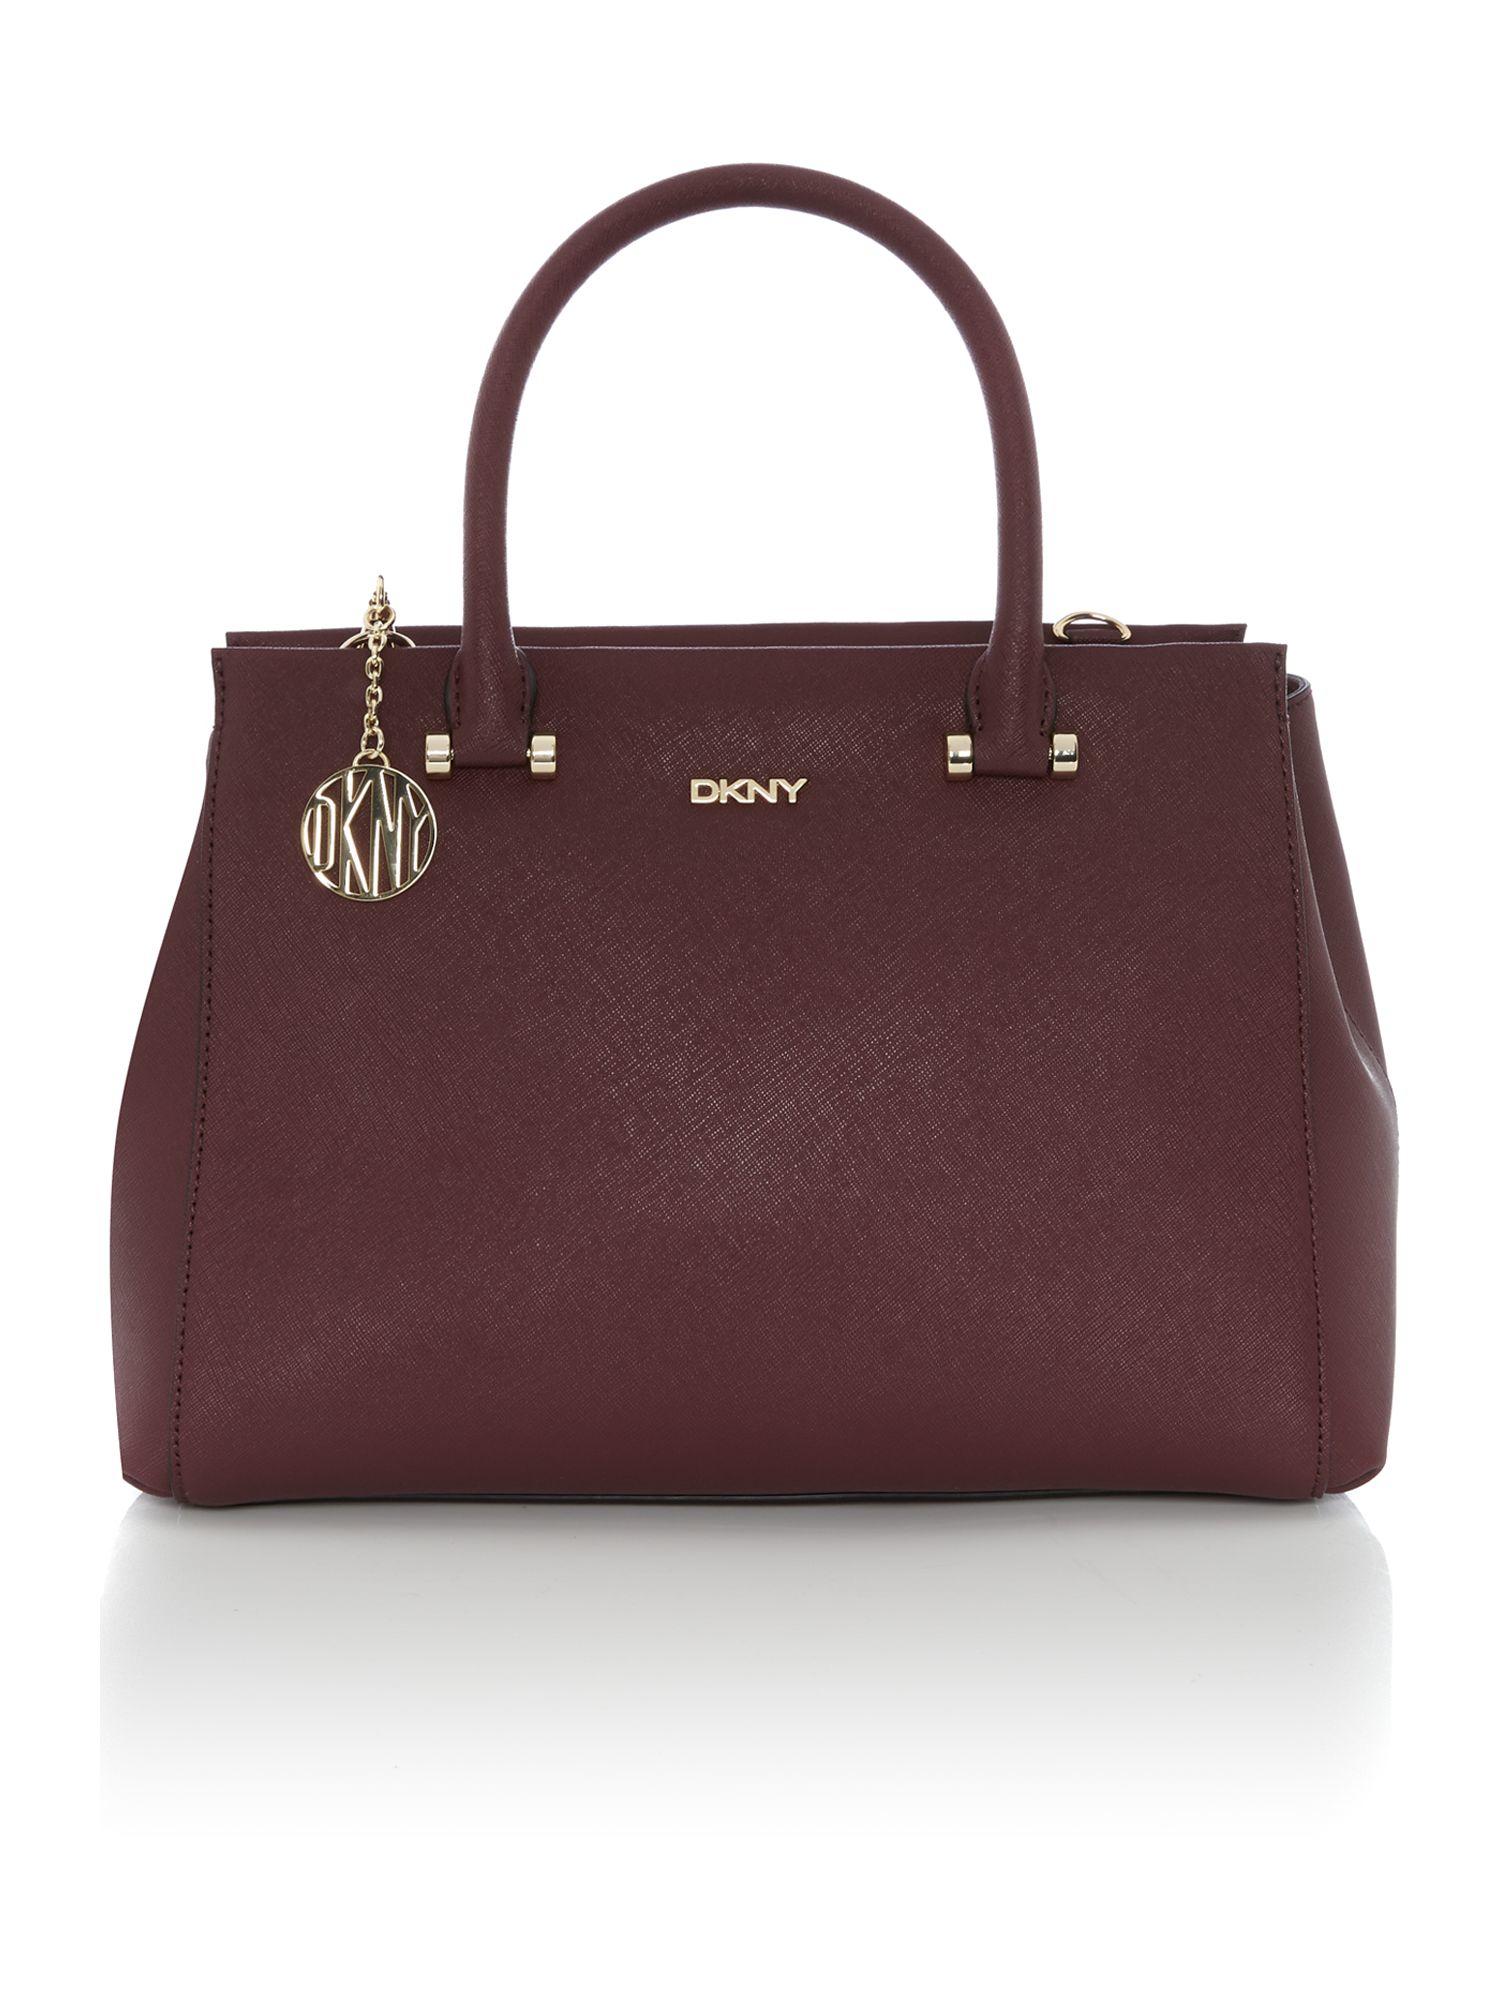 Dkny Saffiano Burgundy Large Satchel Bag in Purple | Lyst